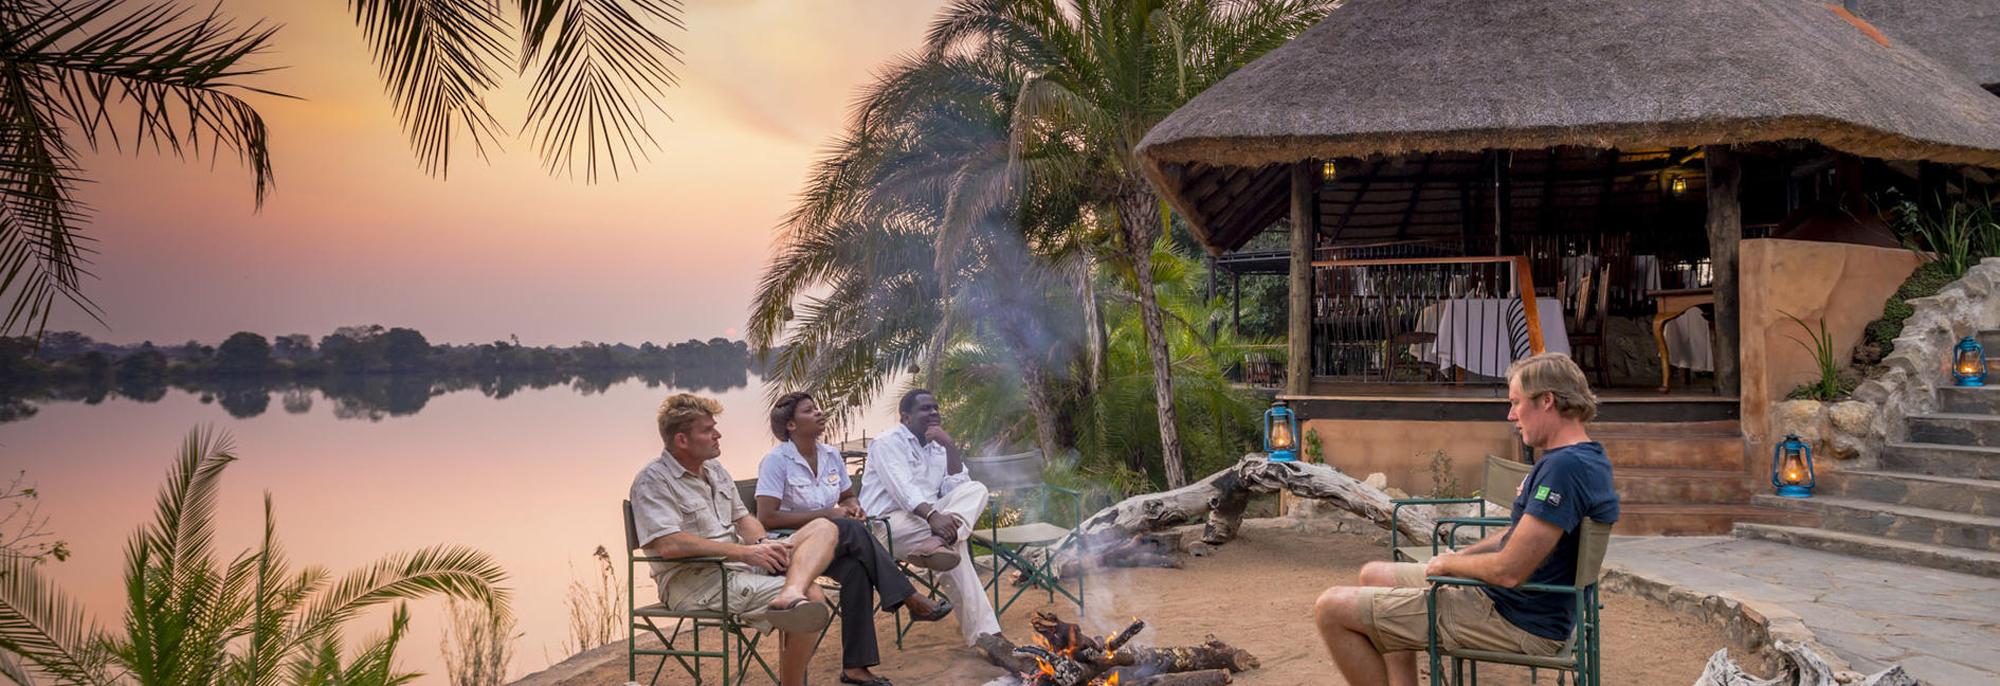 Guests around campfire at Mukambi Safari Lodge